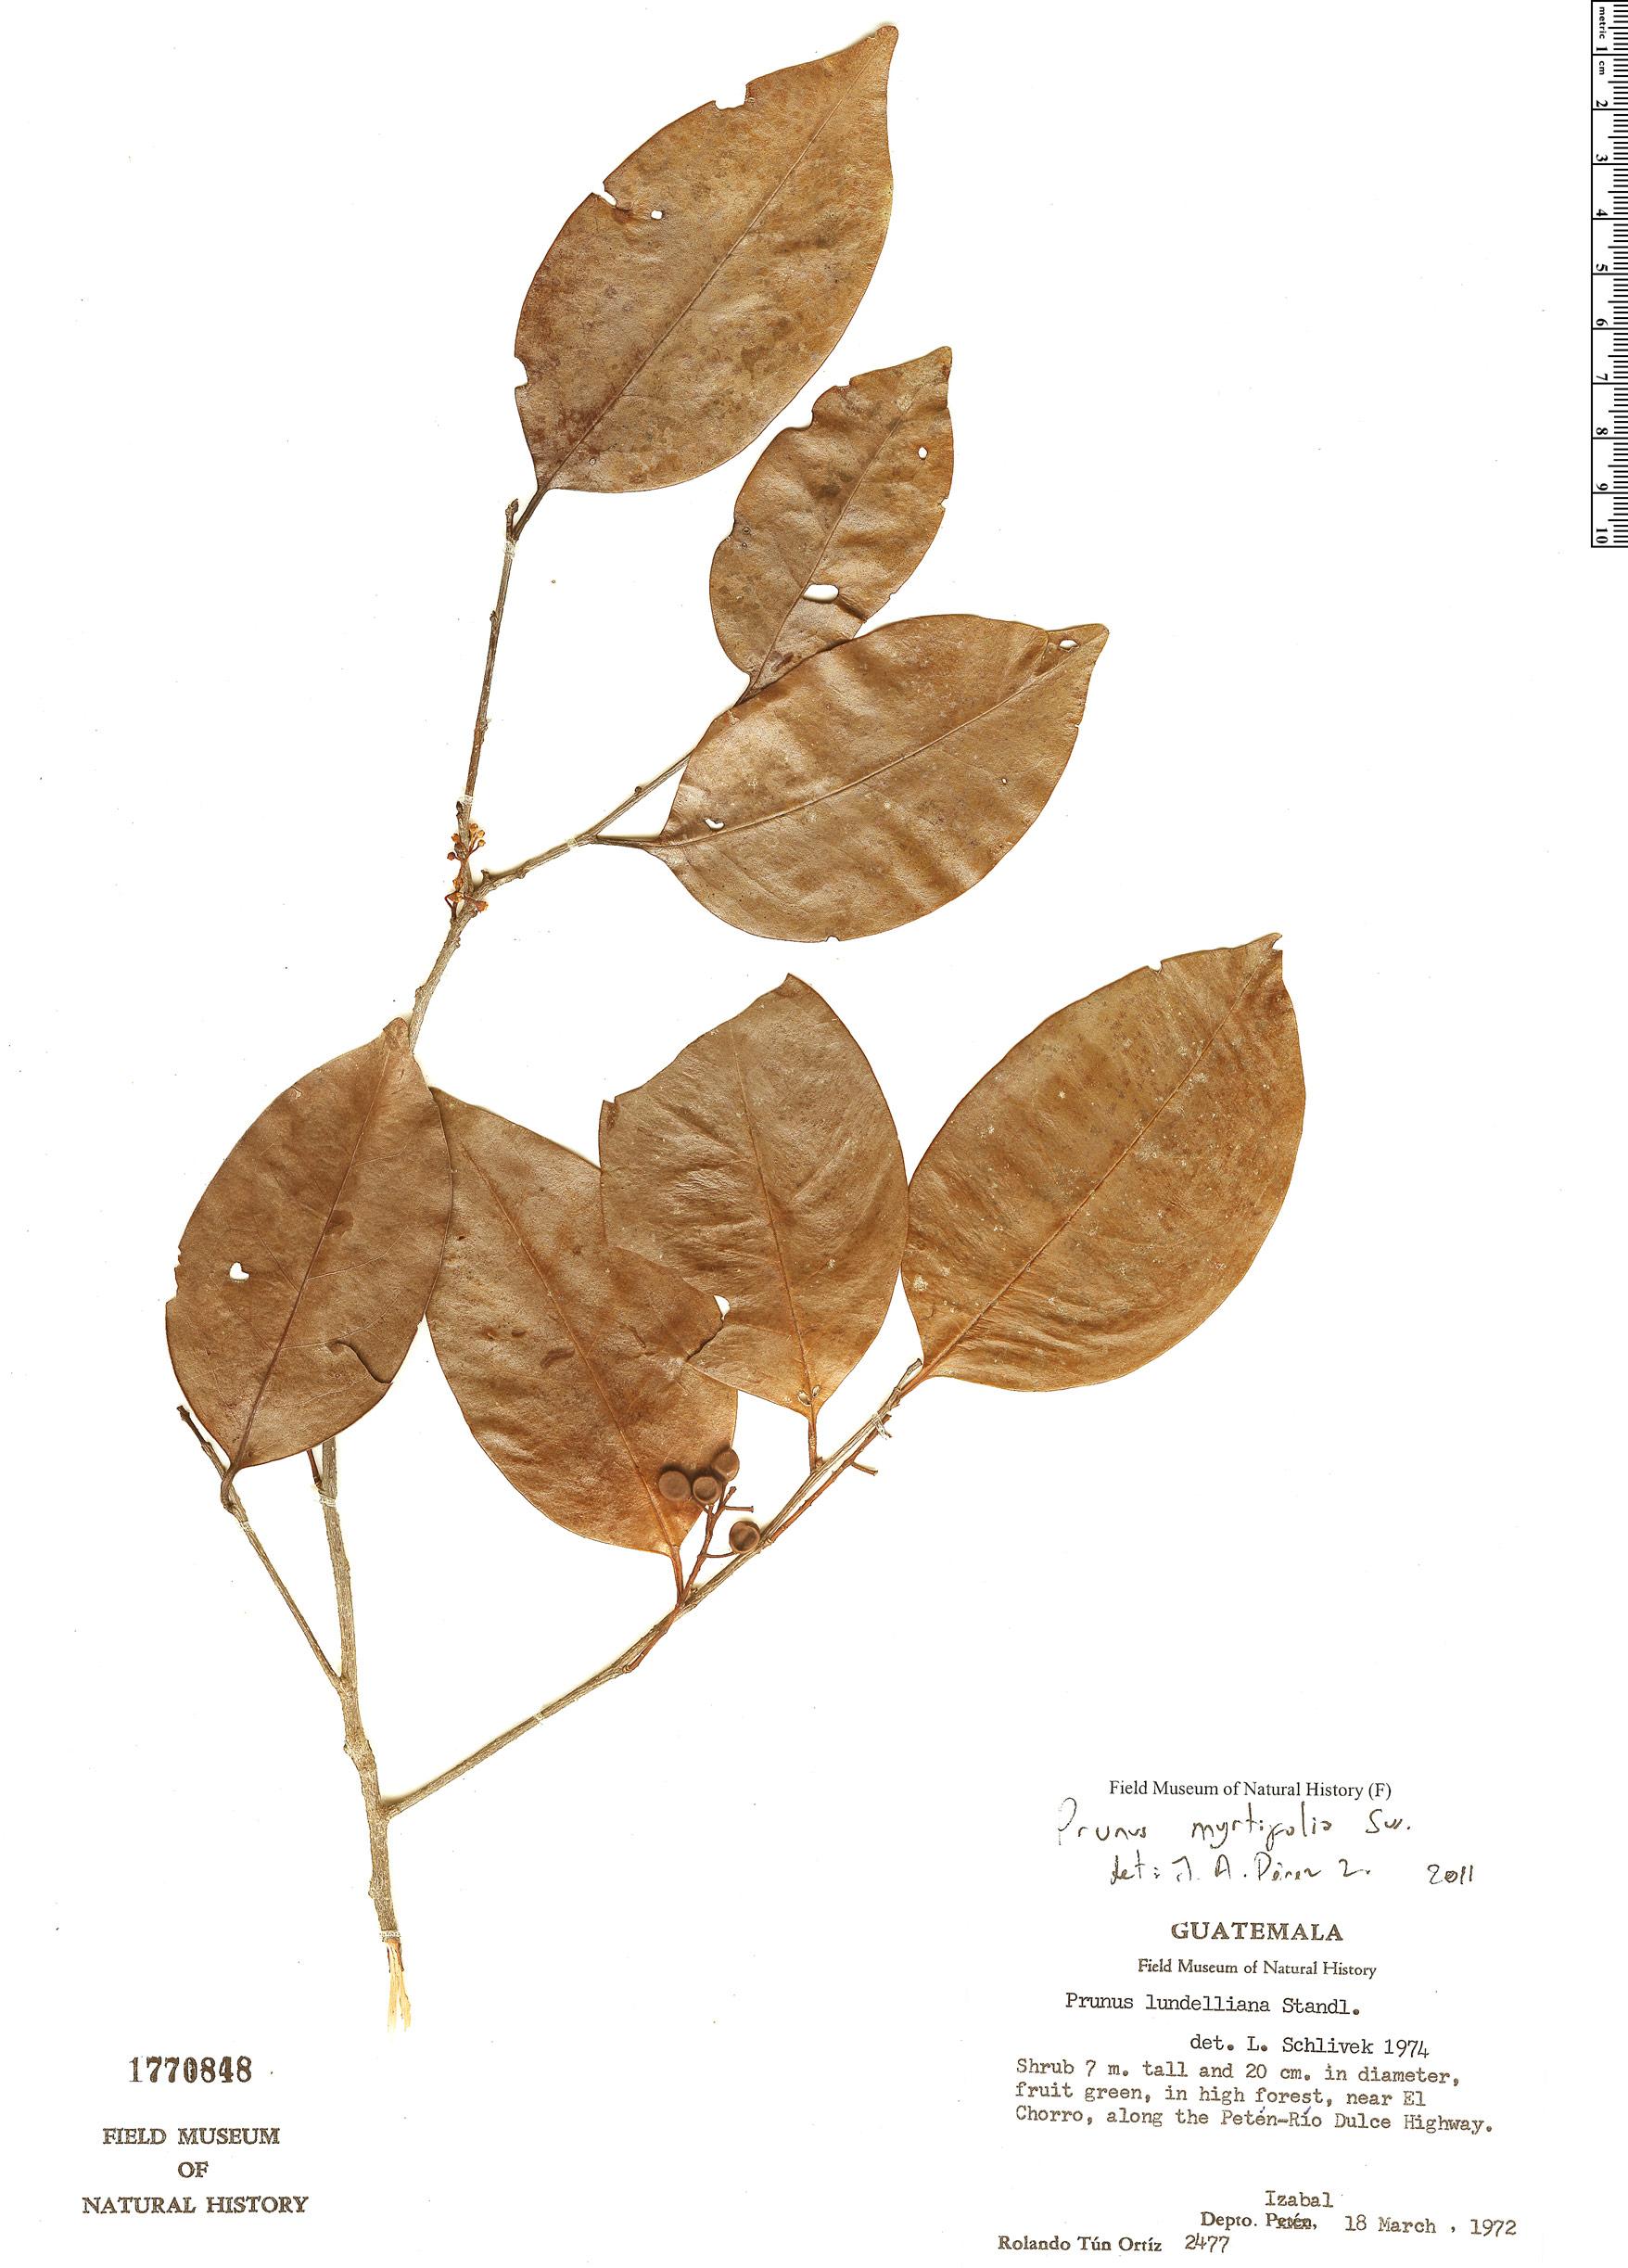 Specimen: Prunus myrtifolia